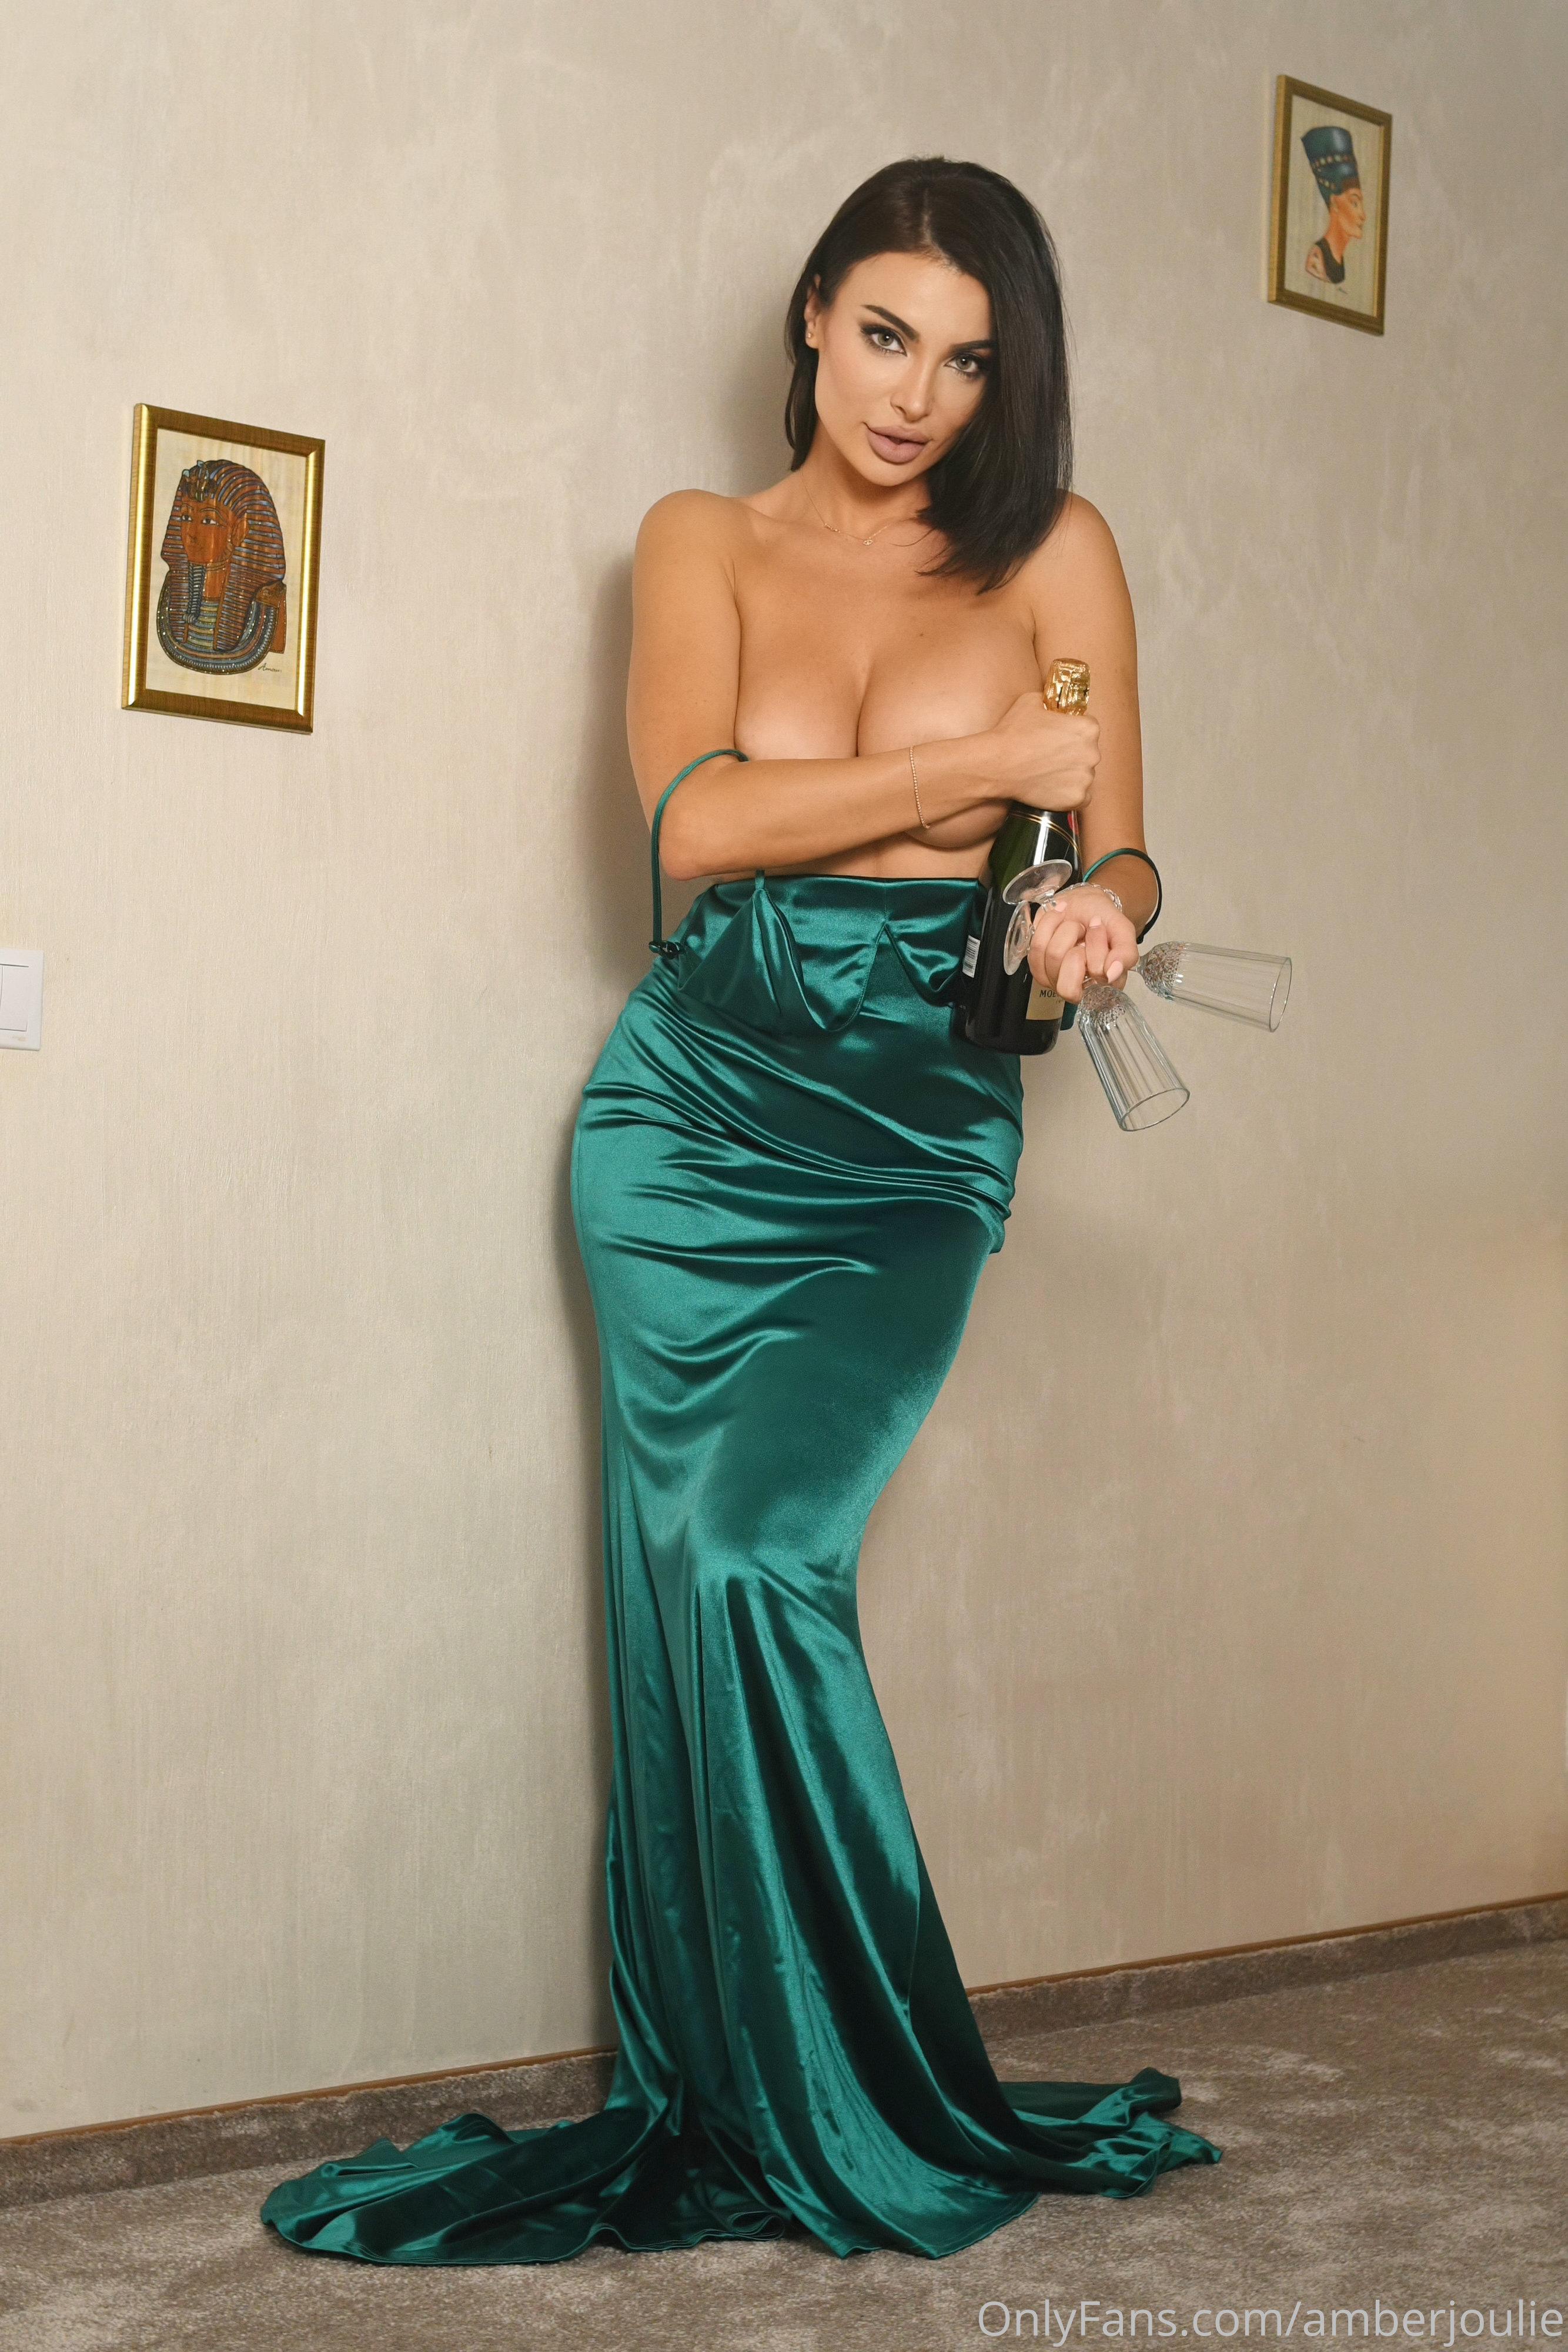 @amberjoulie nude photo 40